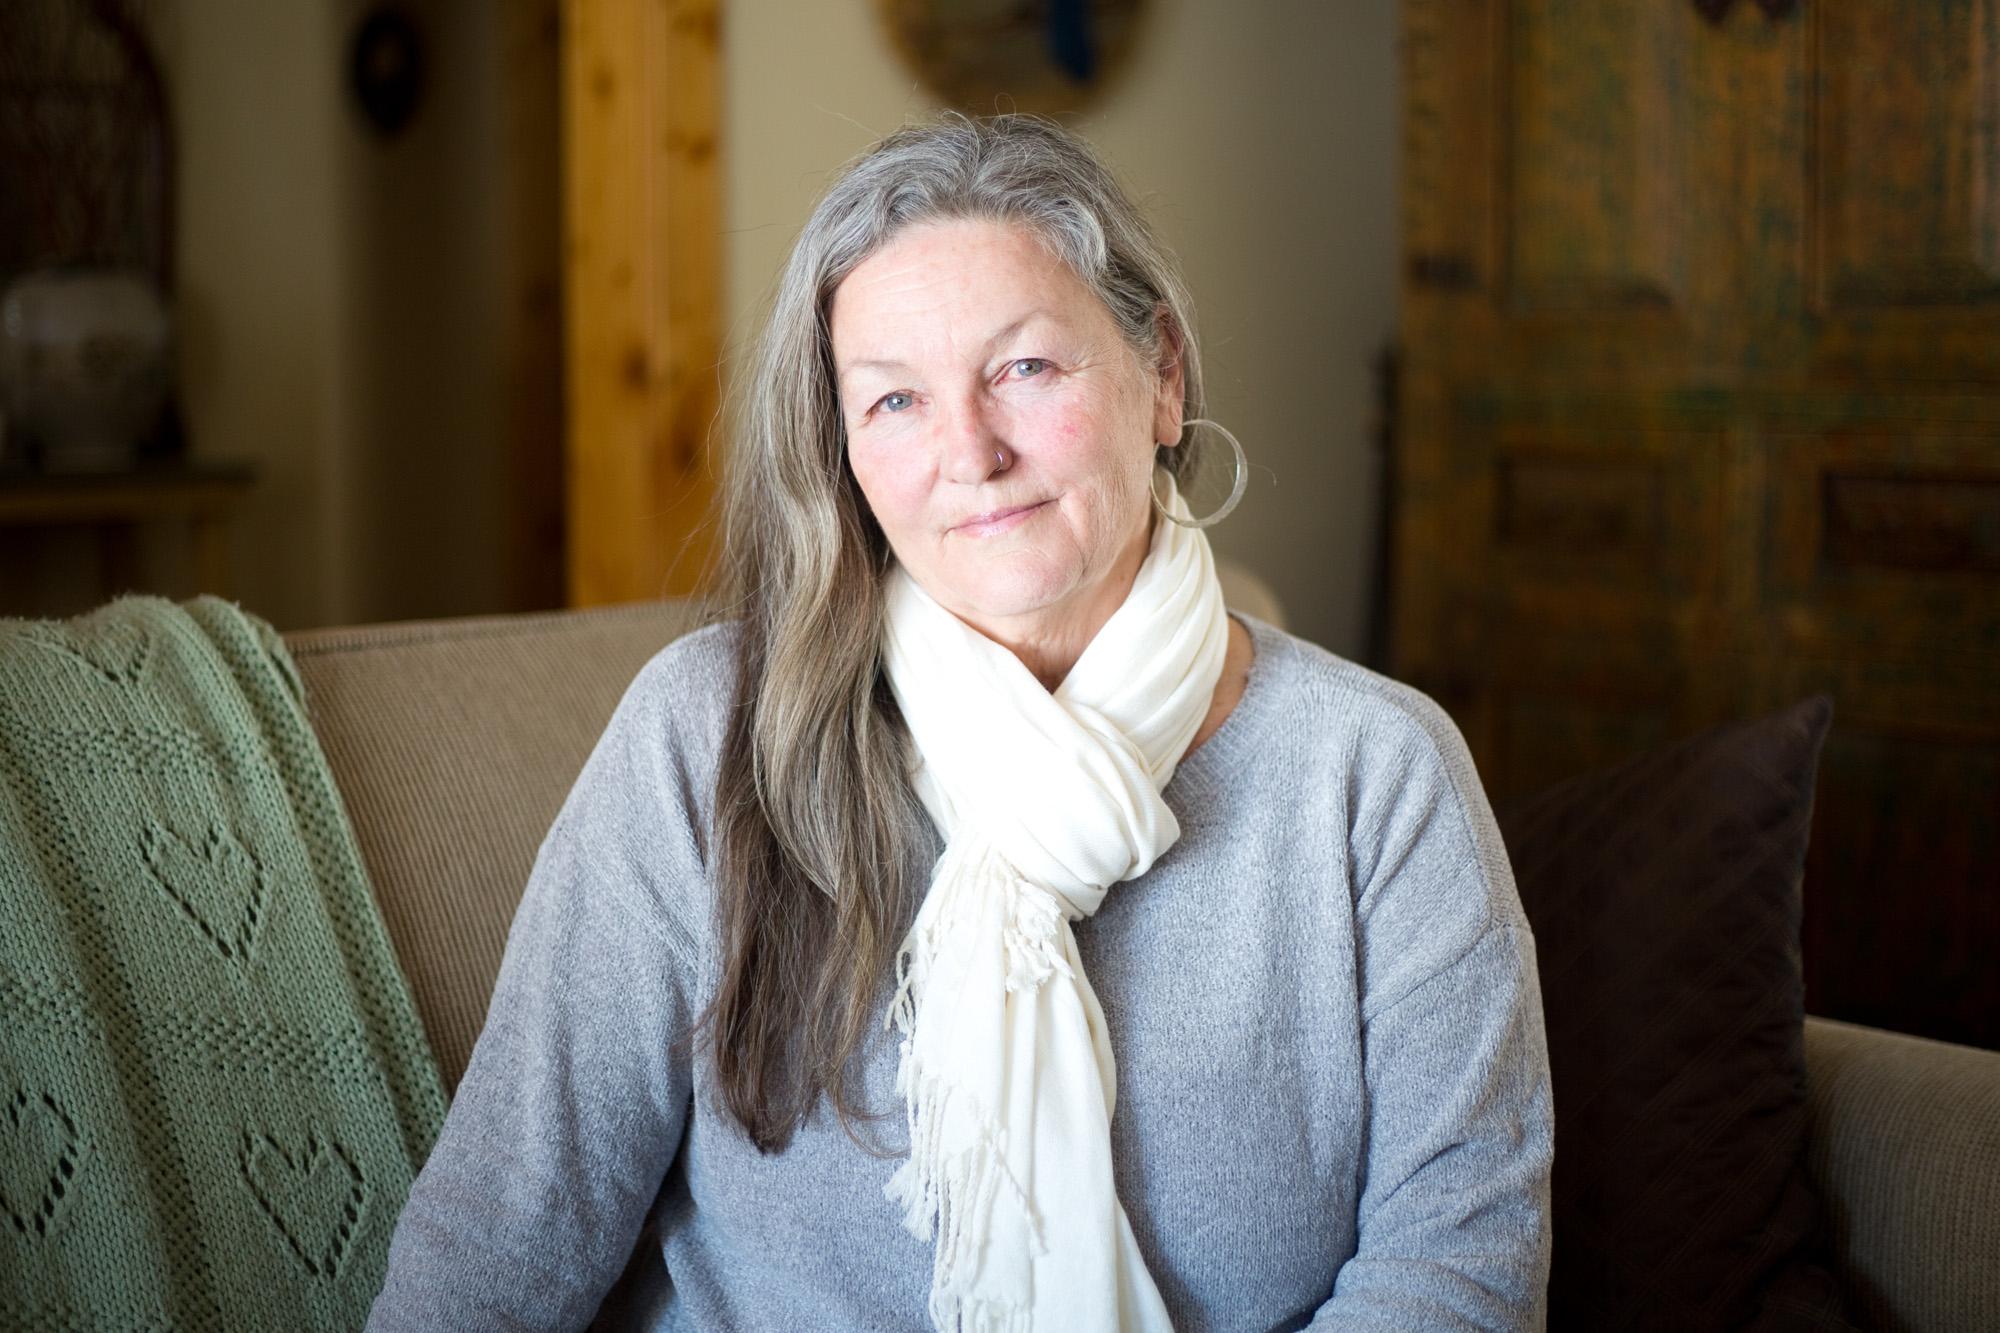 Katie Cavanaugh, 63, at her home